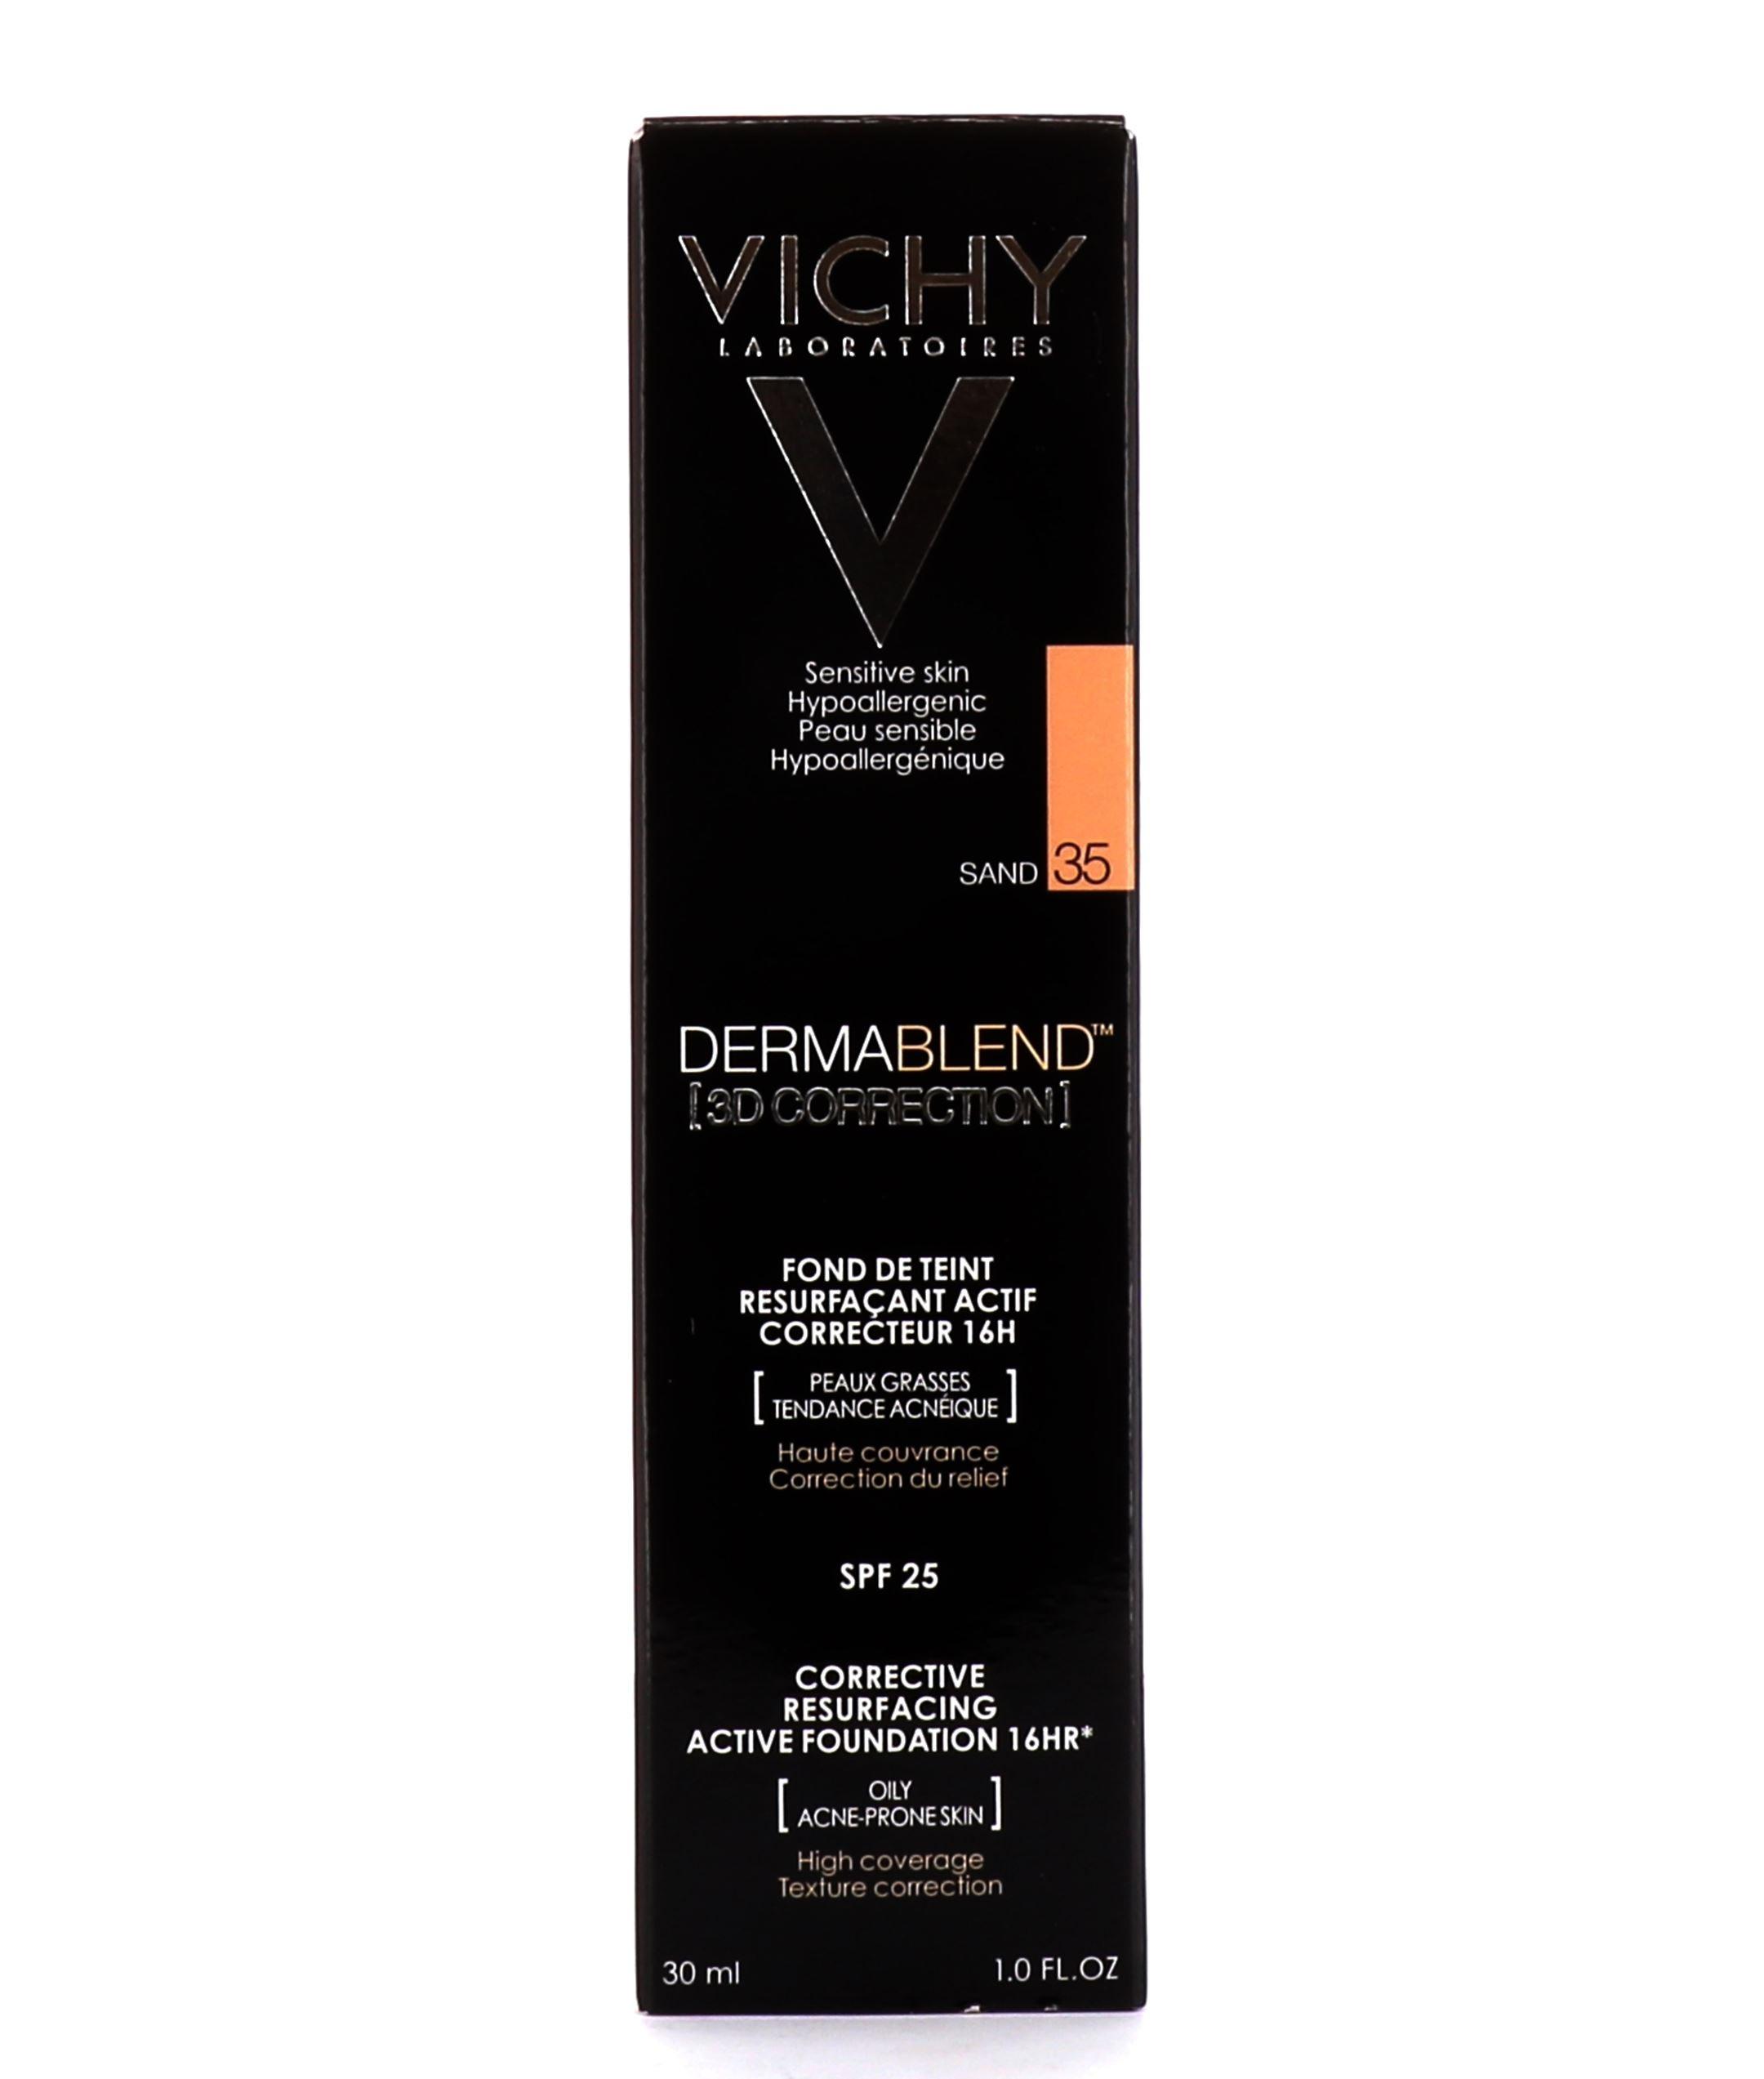 Vichy Dermablend Fond De Teint 3d Correction